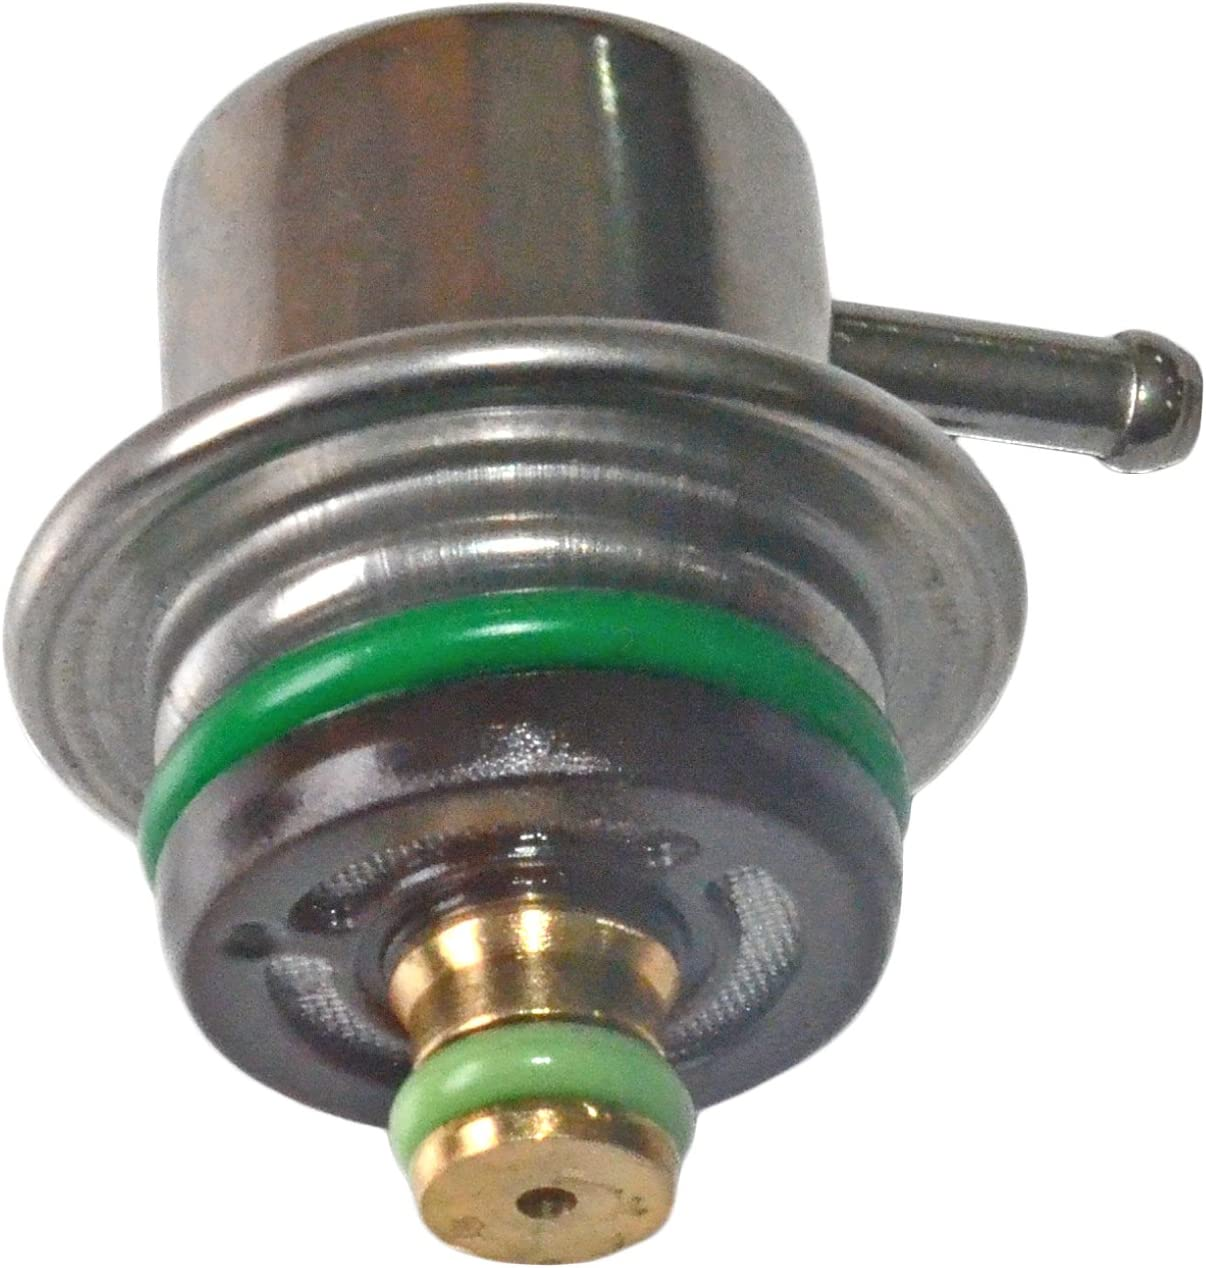 New Fuel Pressure Regulator For Ford Lincoln F-150 F-250 F-350 V8 XR3Z9C968AA